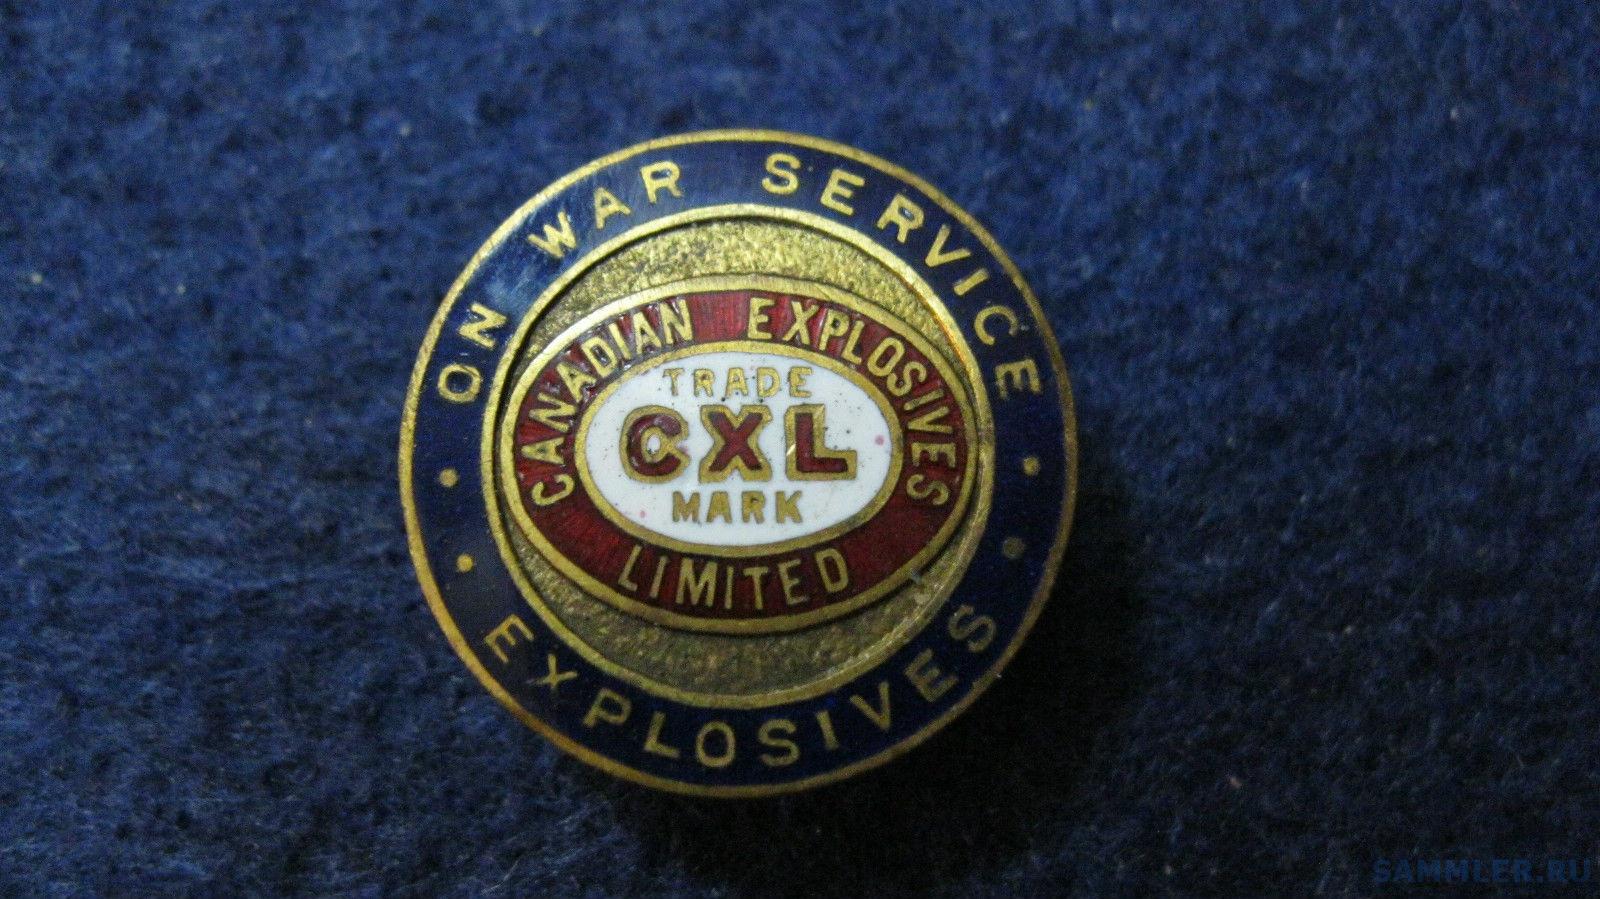 Canadian Explosives Limited On War Service.jpg